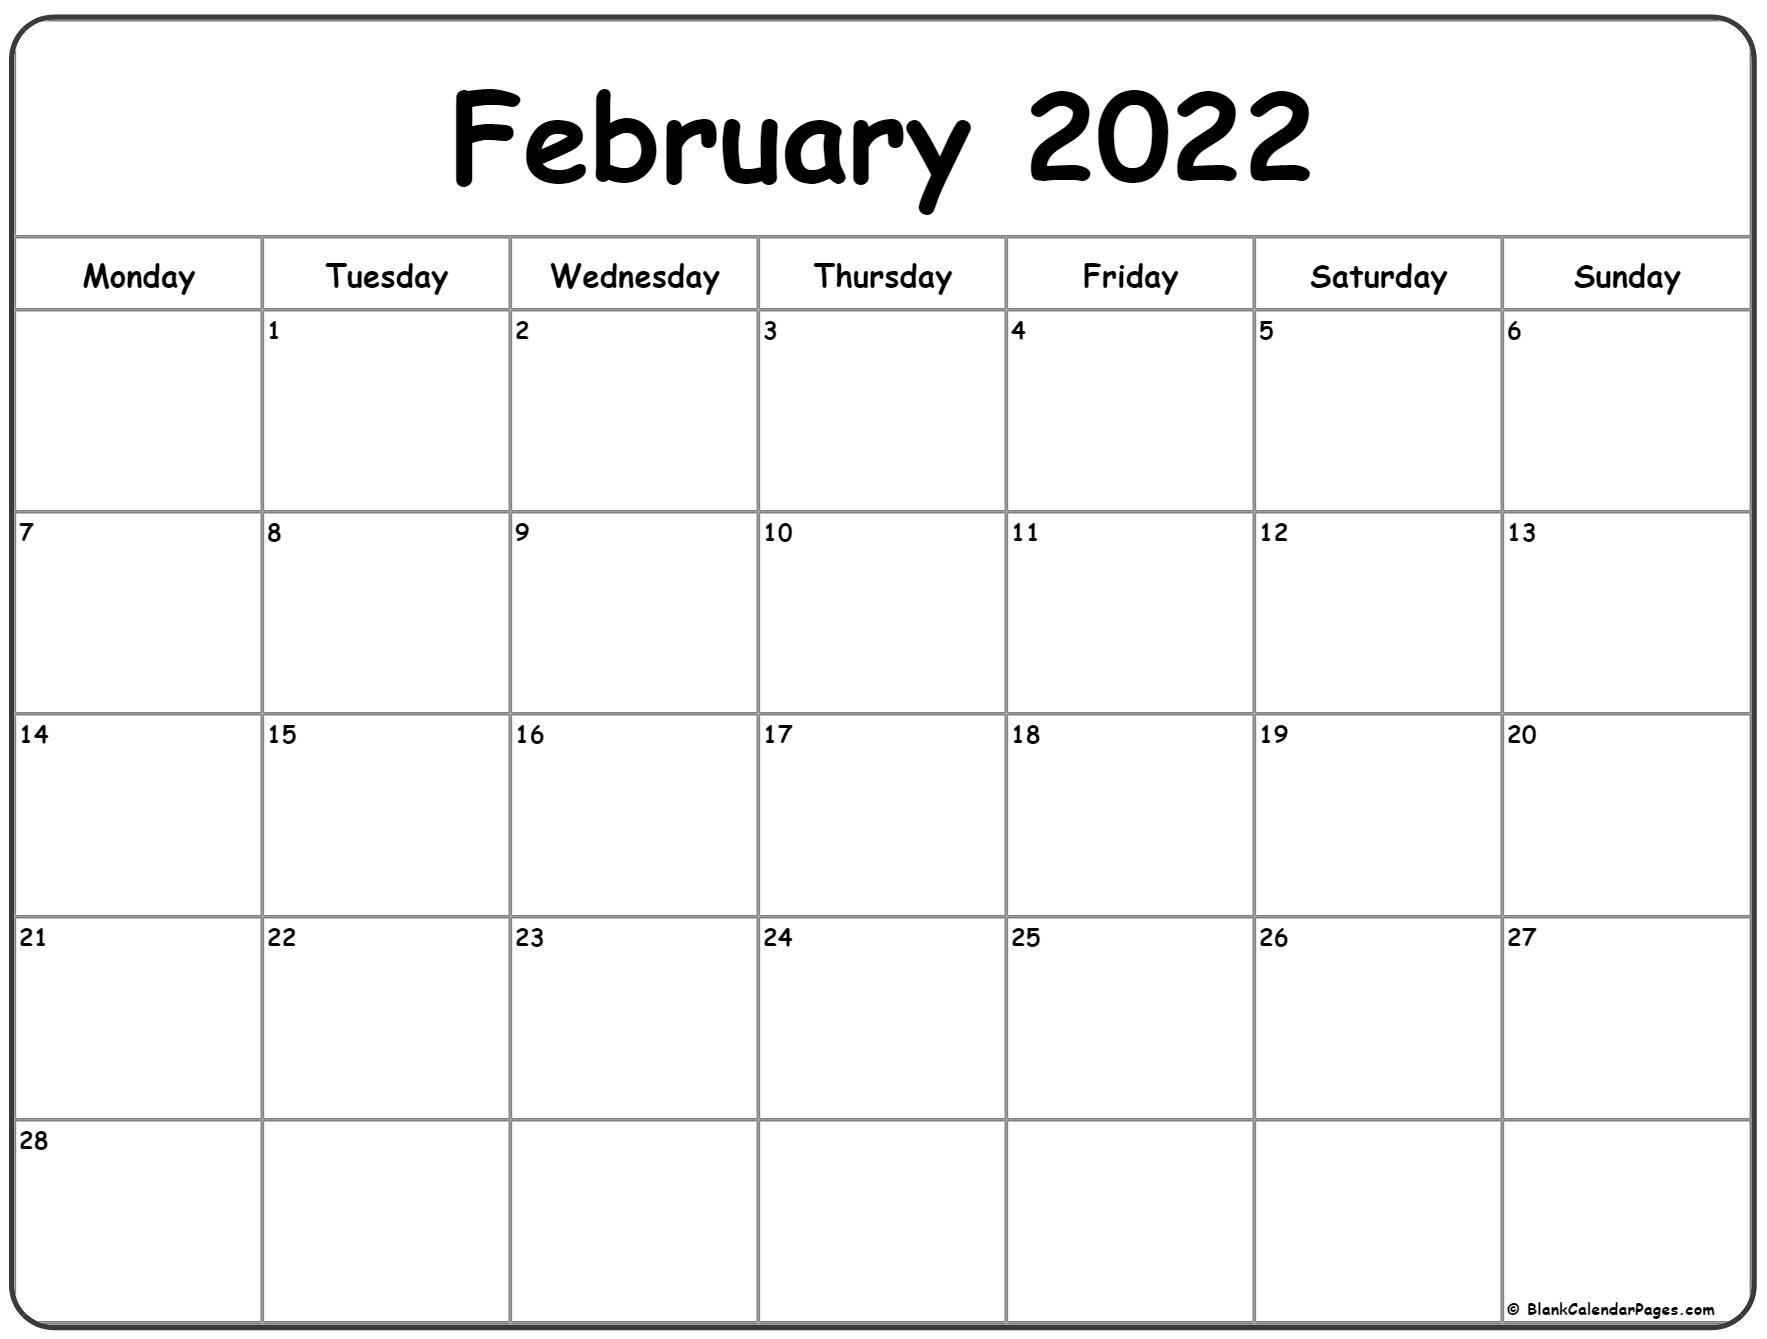 February 2022 Monday Calendar | Monday To Sunday